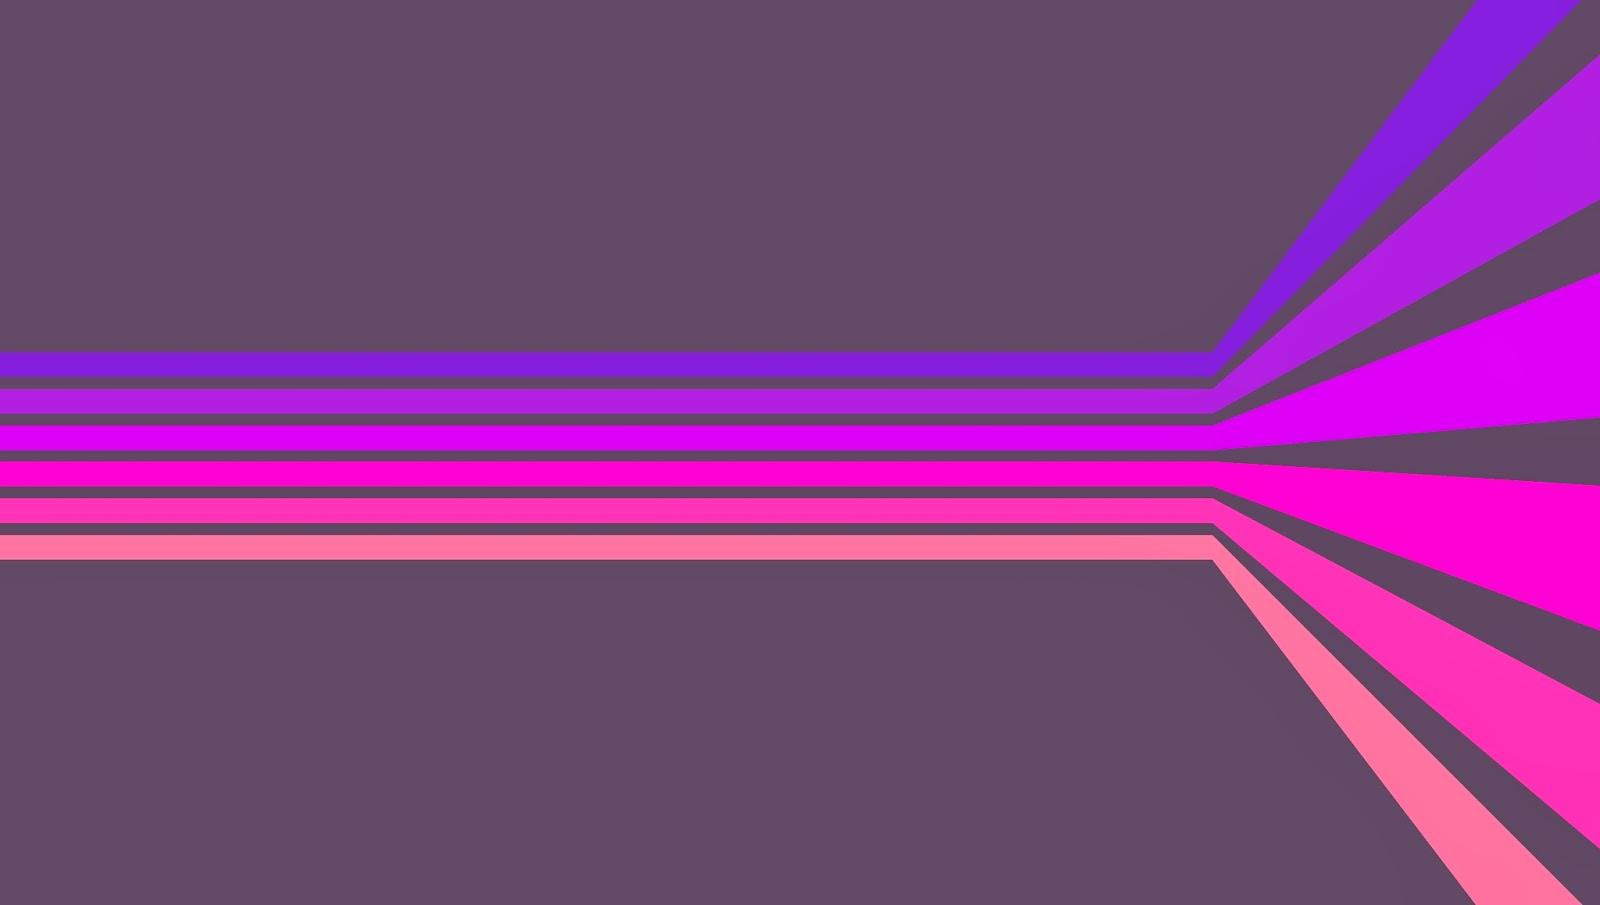 Fruitymixers Wallpapers Violet Simple Lines Rainbow